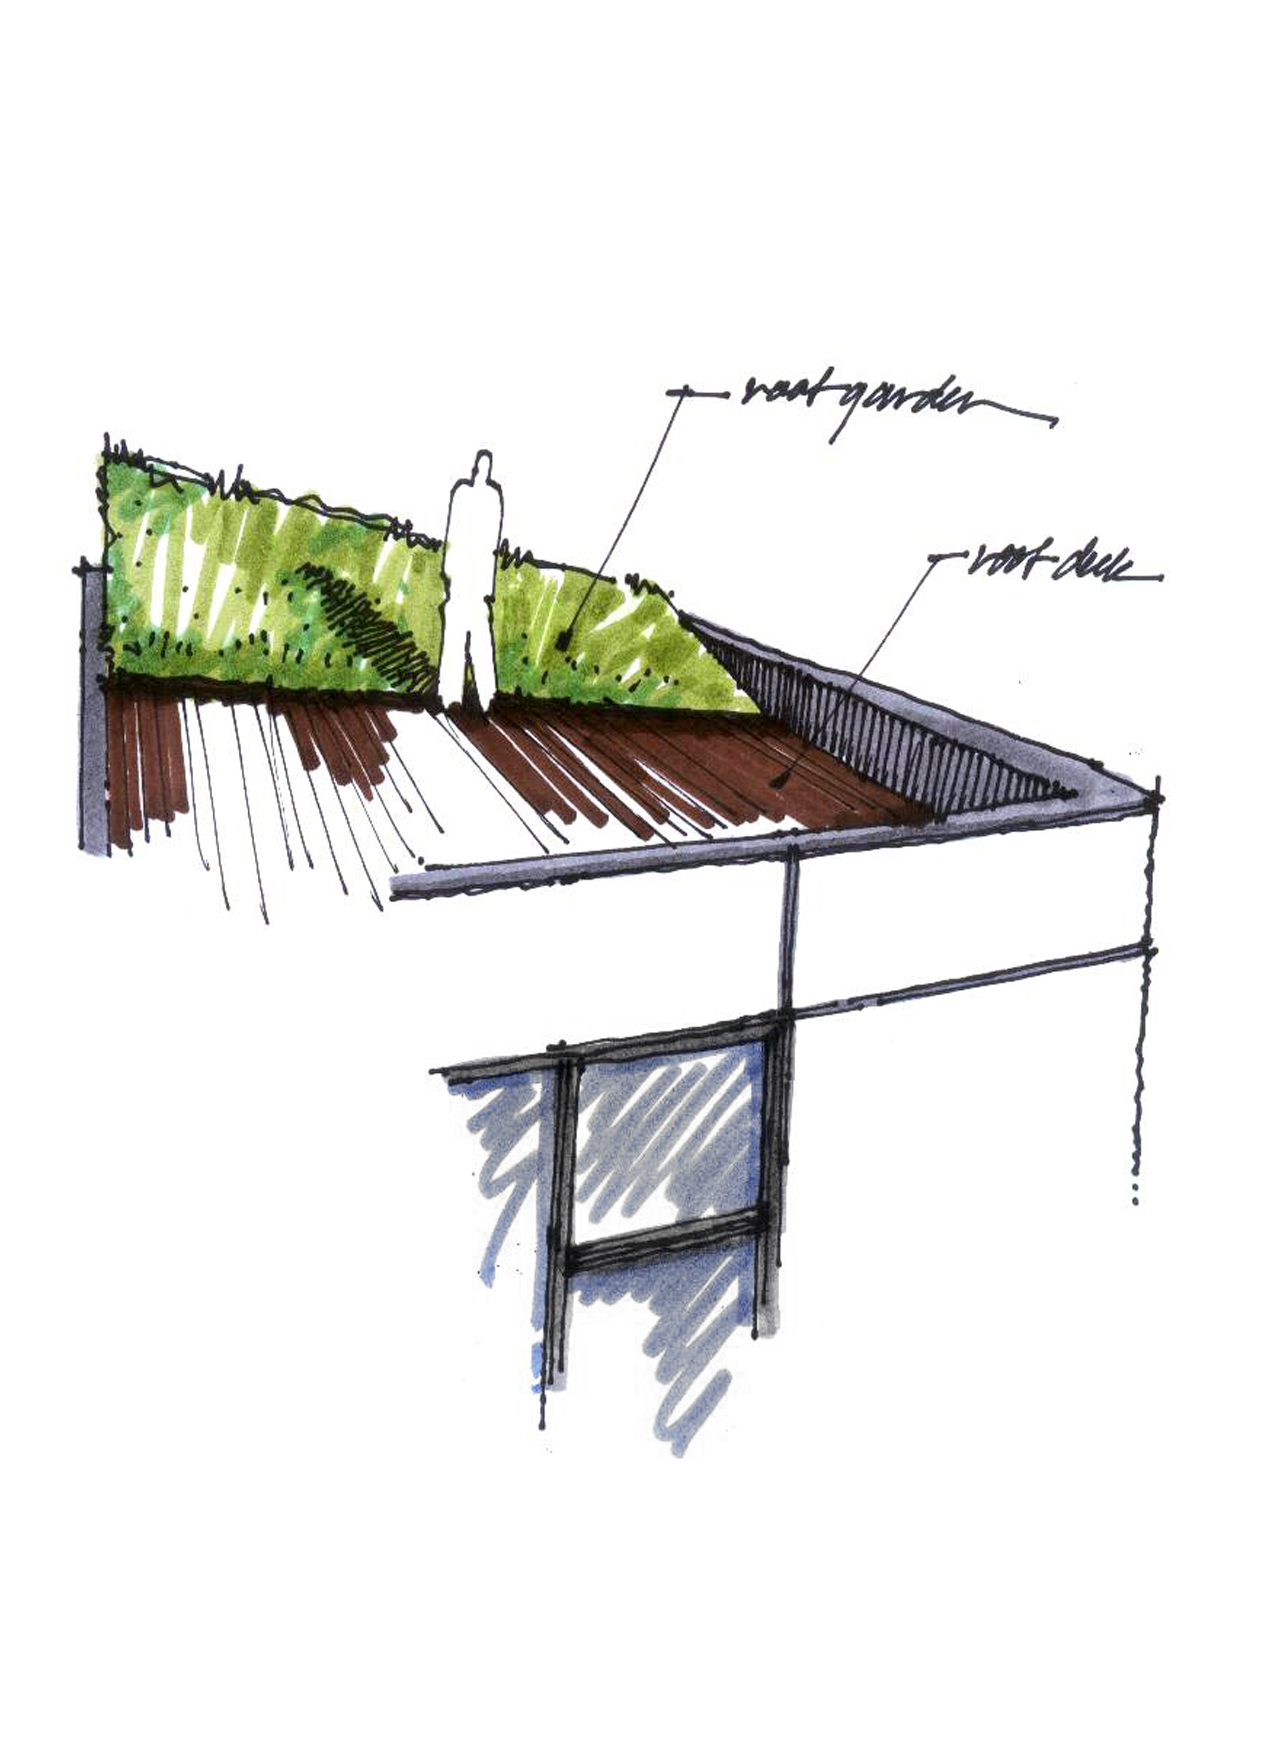 eco-lofts_sketch-1.jpg